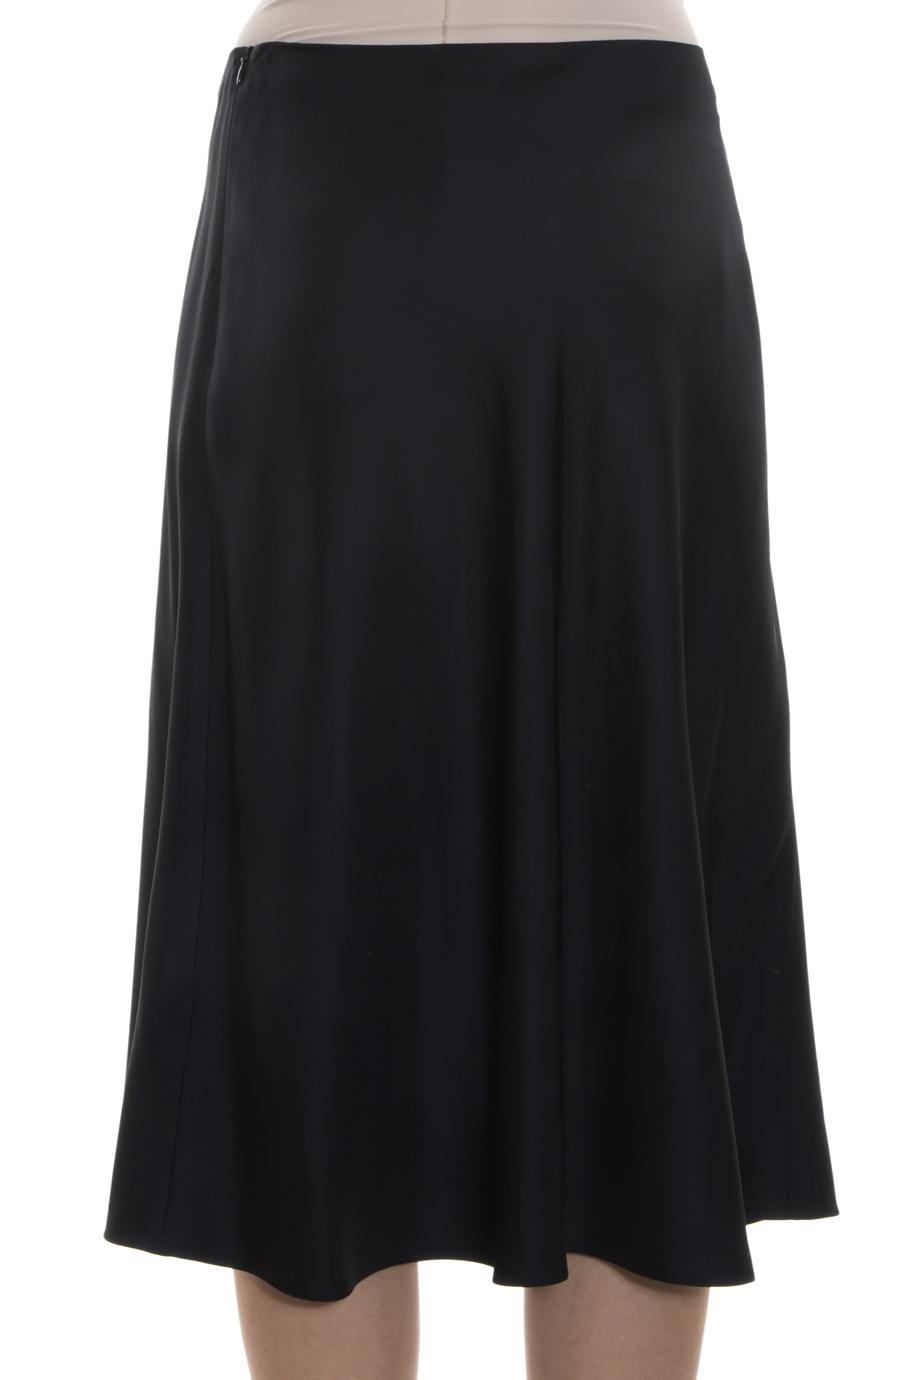 the row midi skirt in black lyst